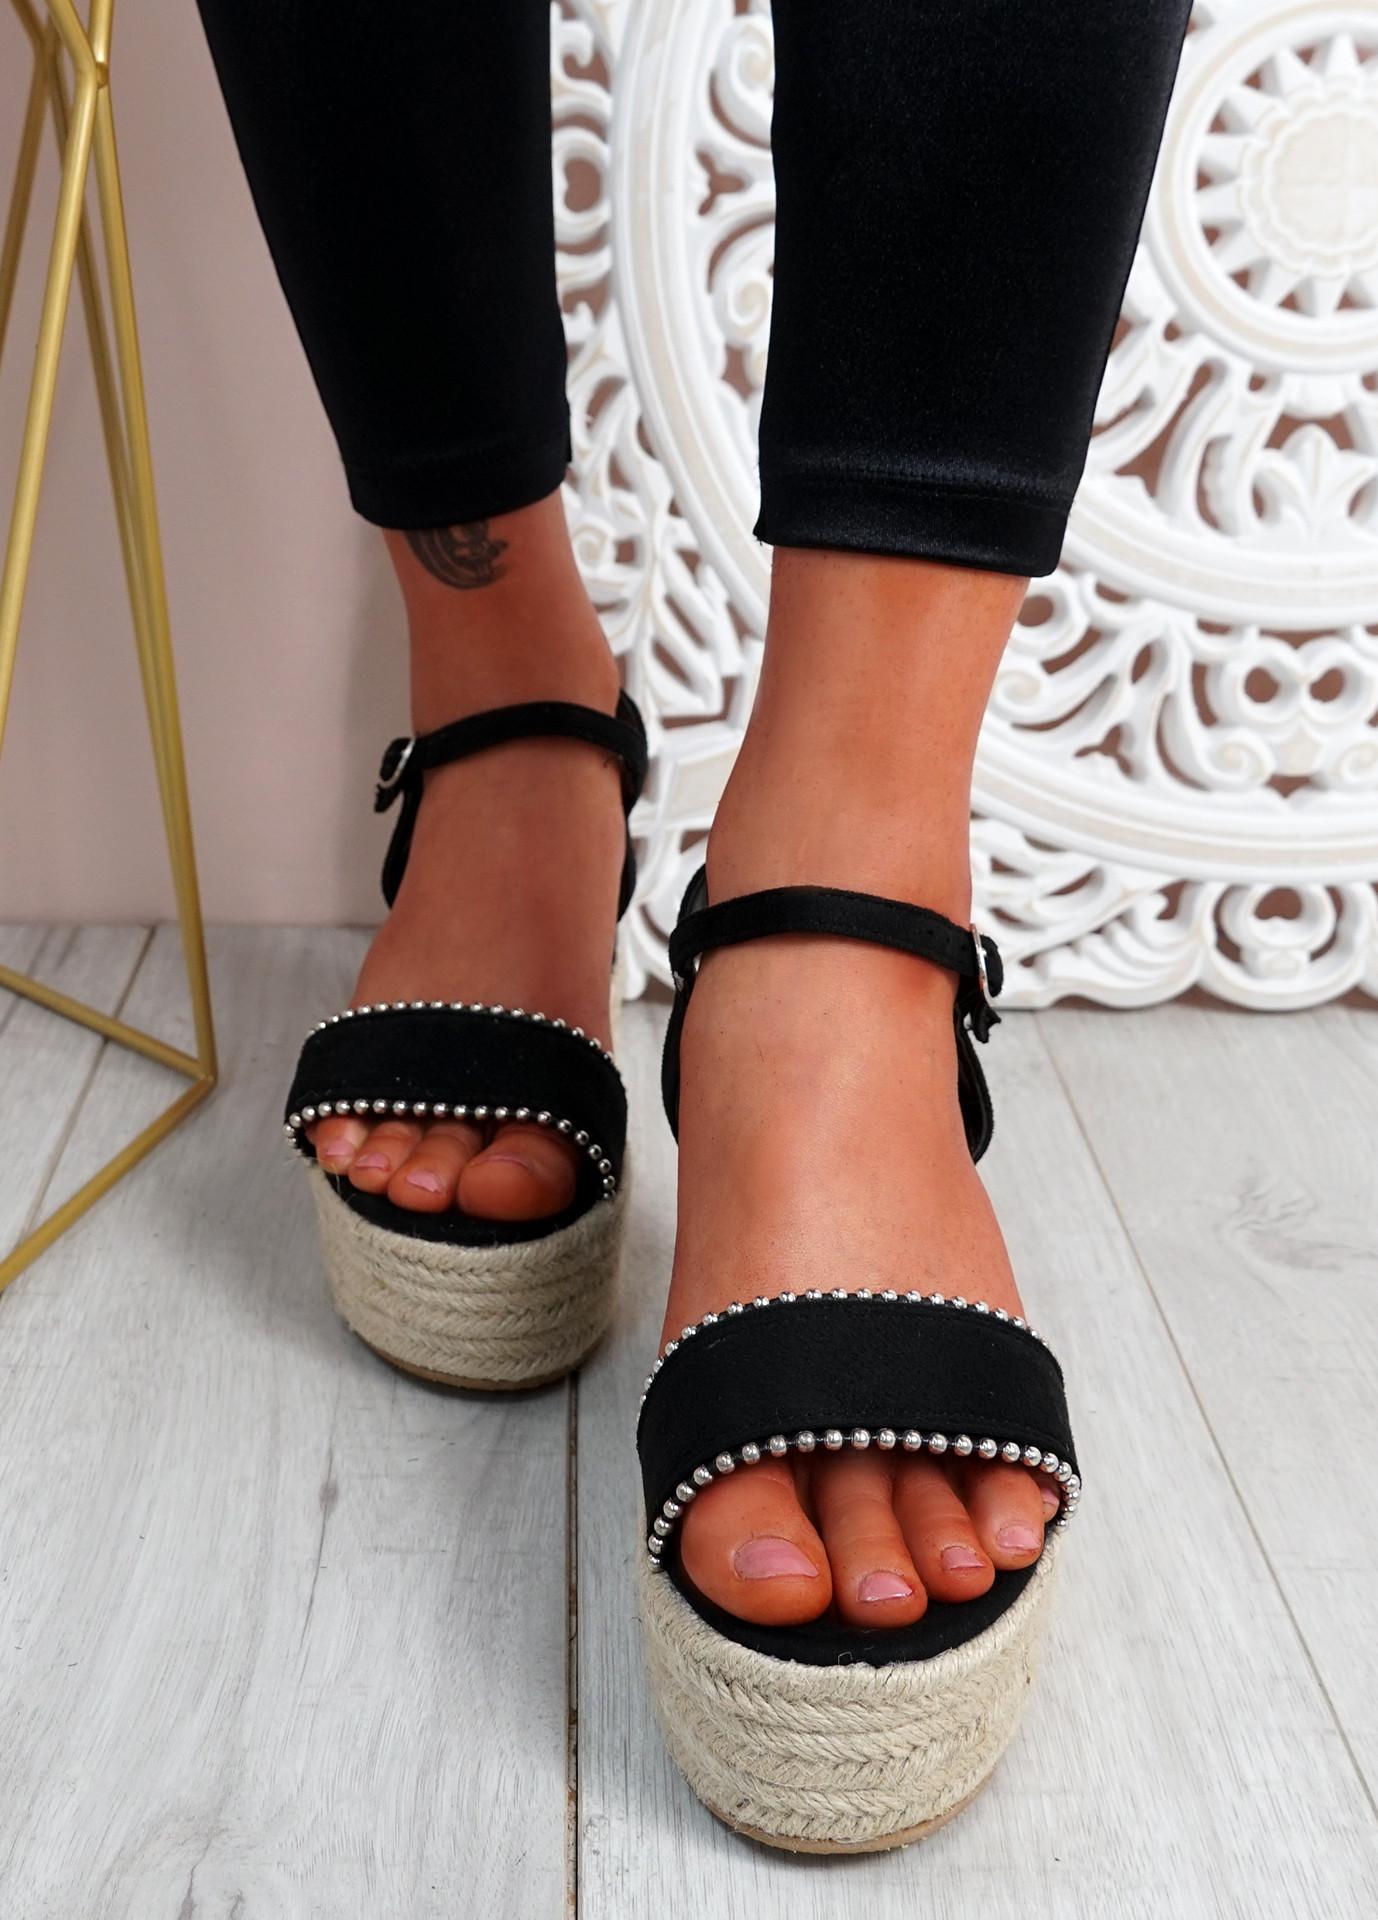 Lavy Black Suede Wedge Platform Sandals